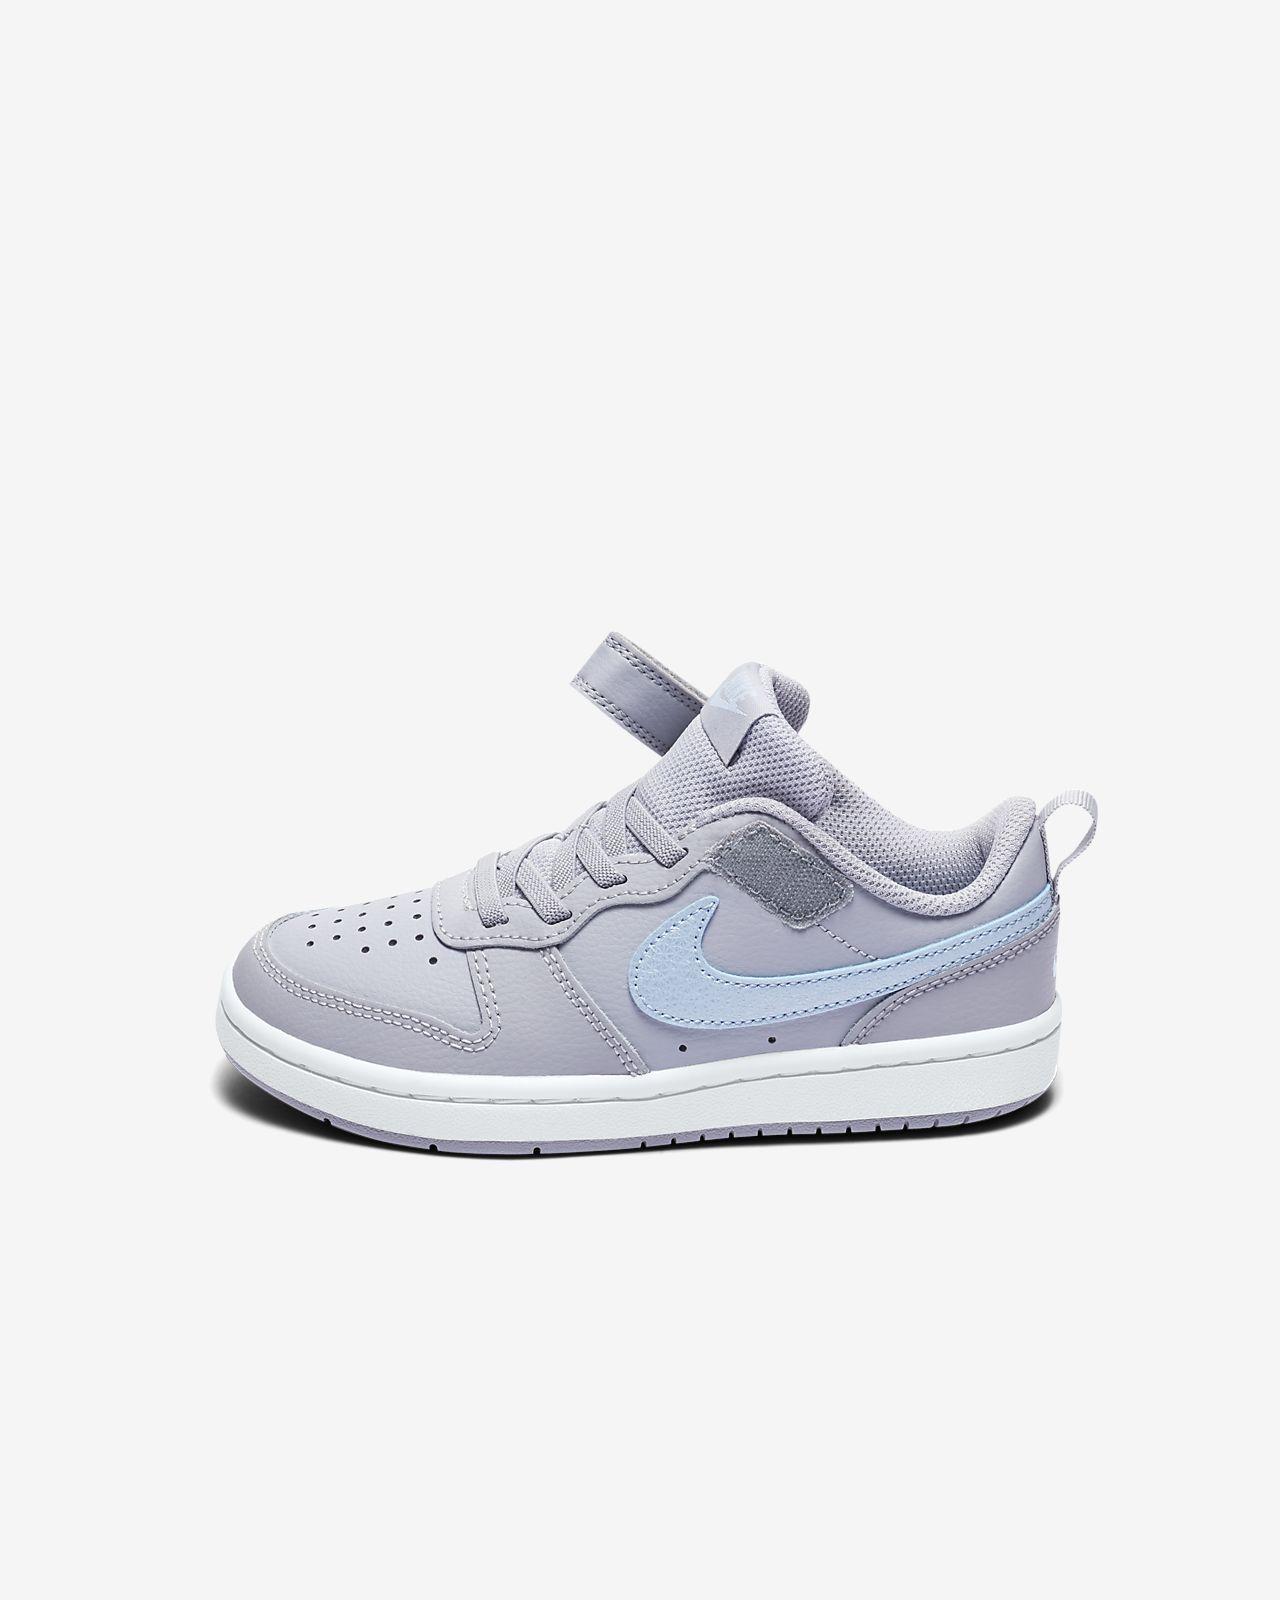 Nike Court Borough Low 2 EP Little Kids' Shoe